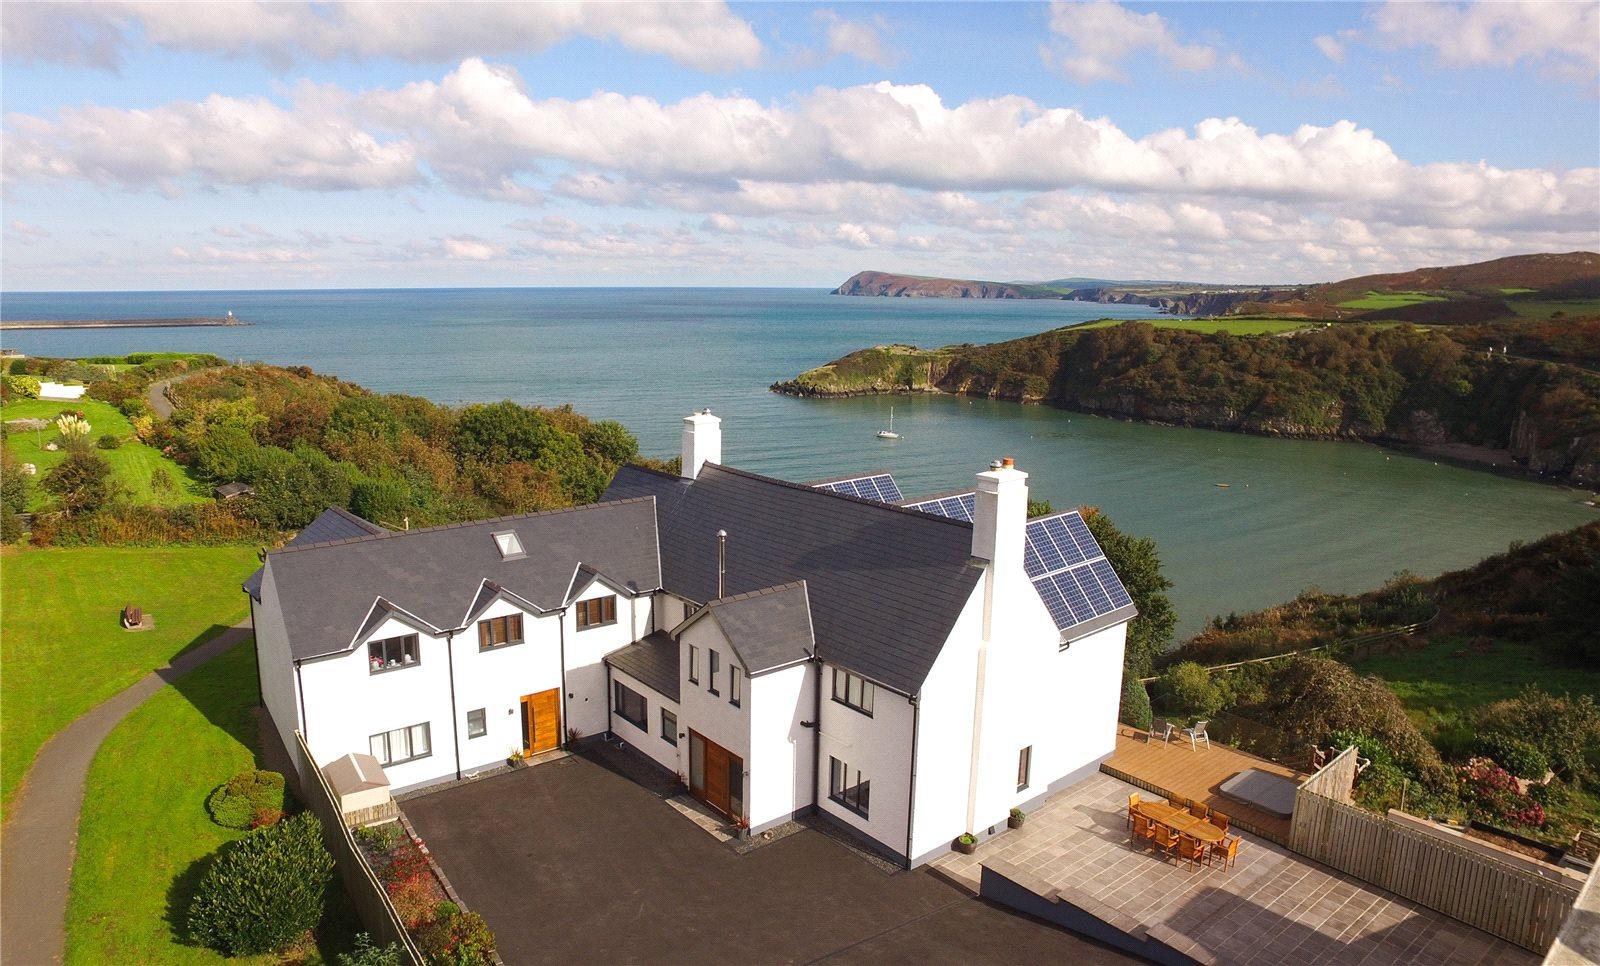 coastal homes property houses Zoopla for sale